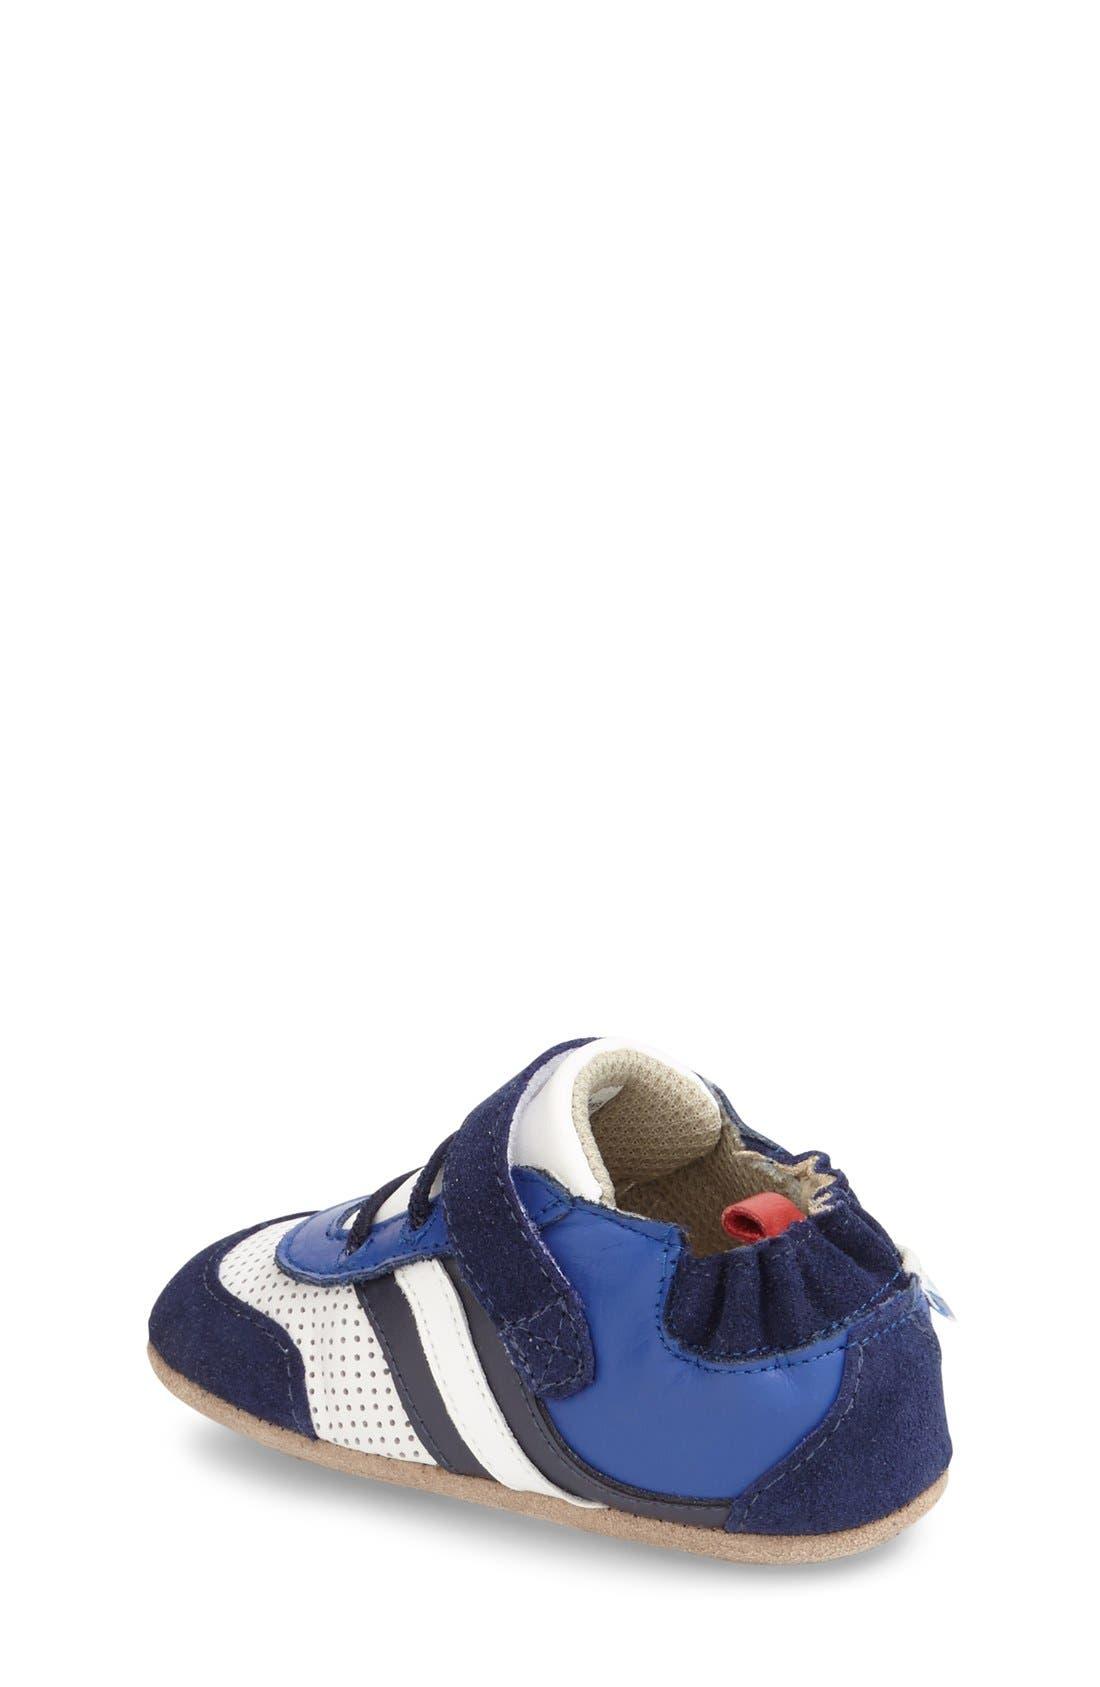 Alternate Image 2  - Robeez® 'Everyday Ethan' Crib Shoe (Baby & Walker)